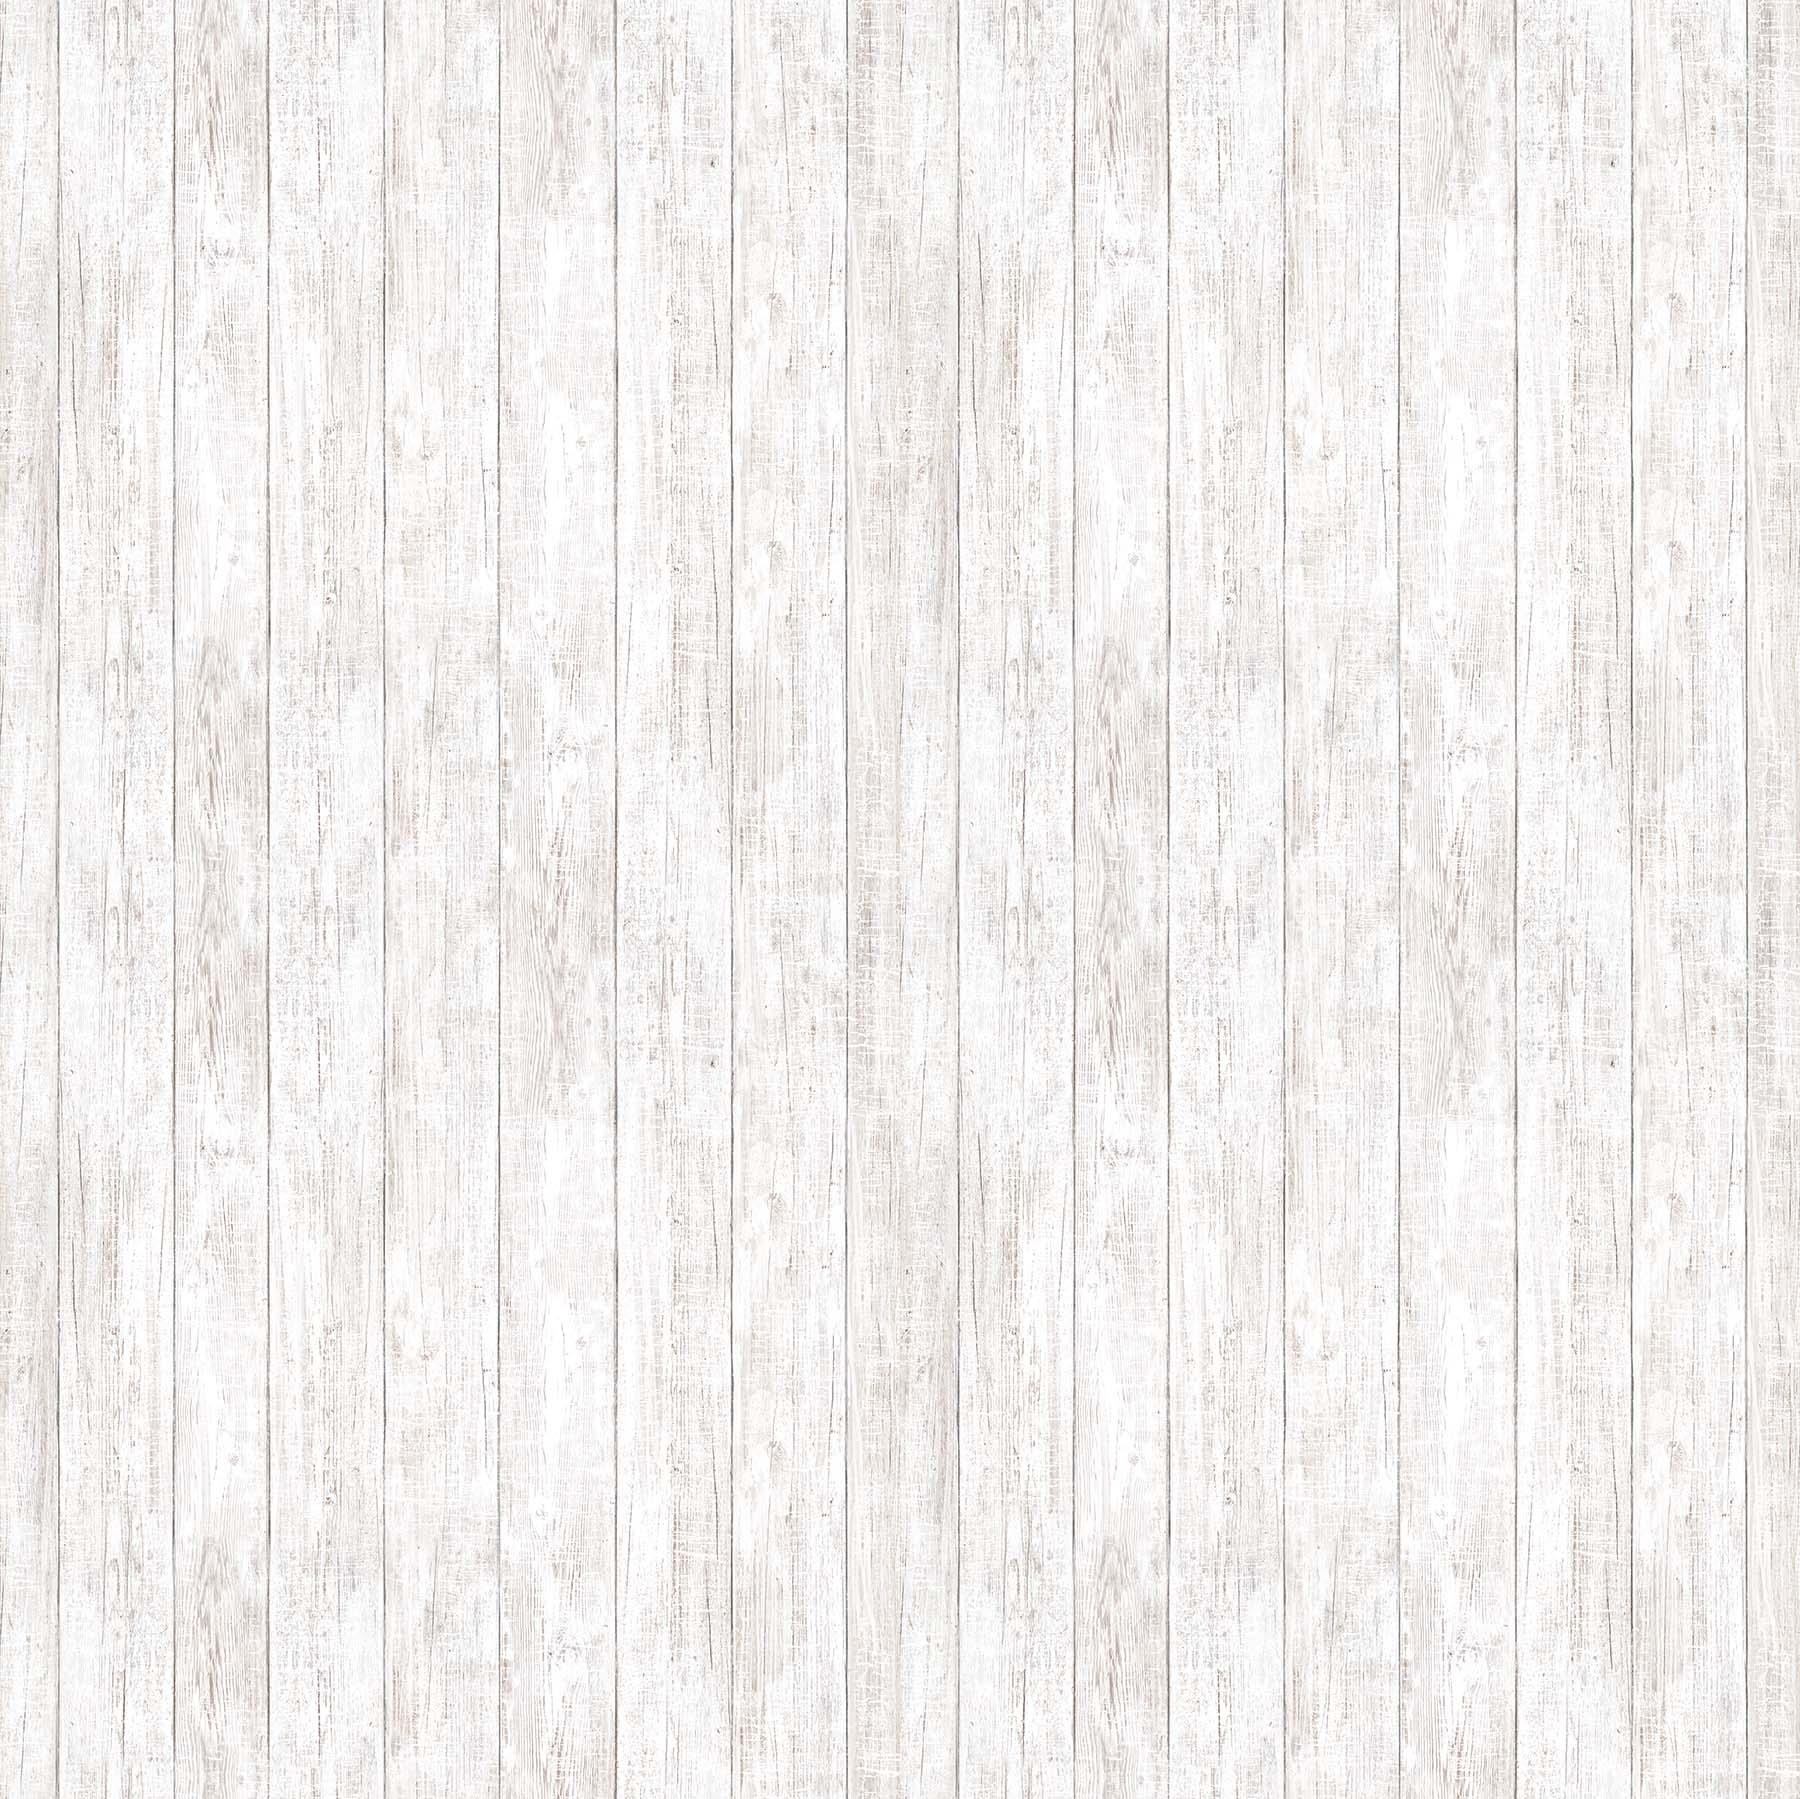 ALPINE WINTER GRAY WHITE 24337-10